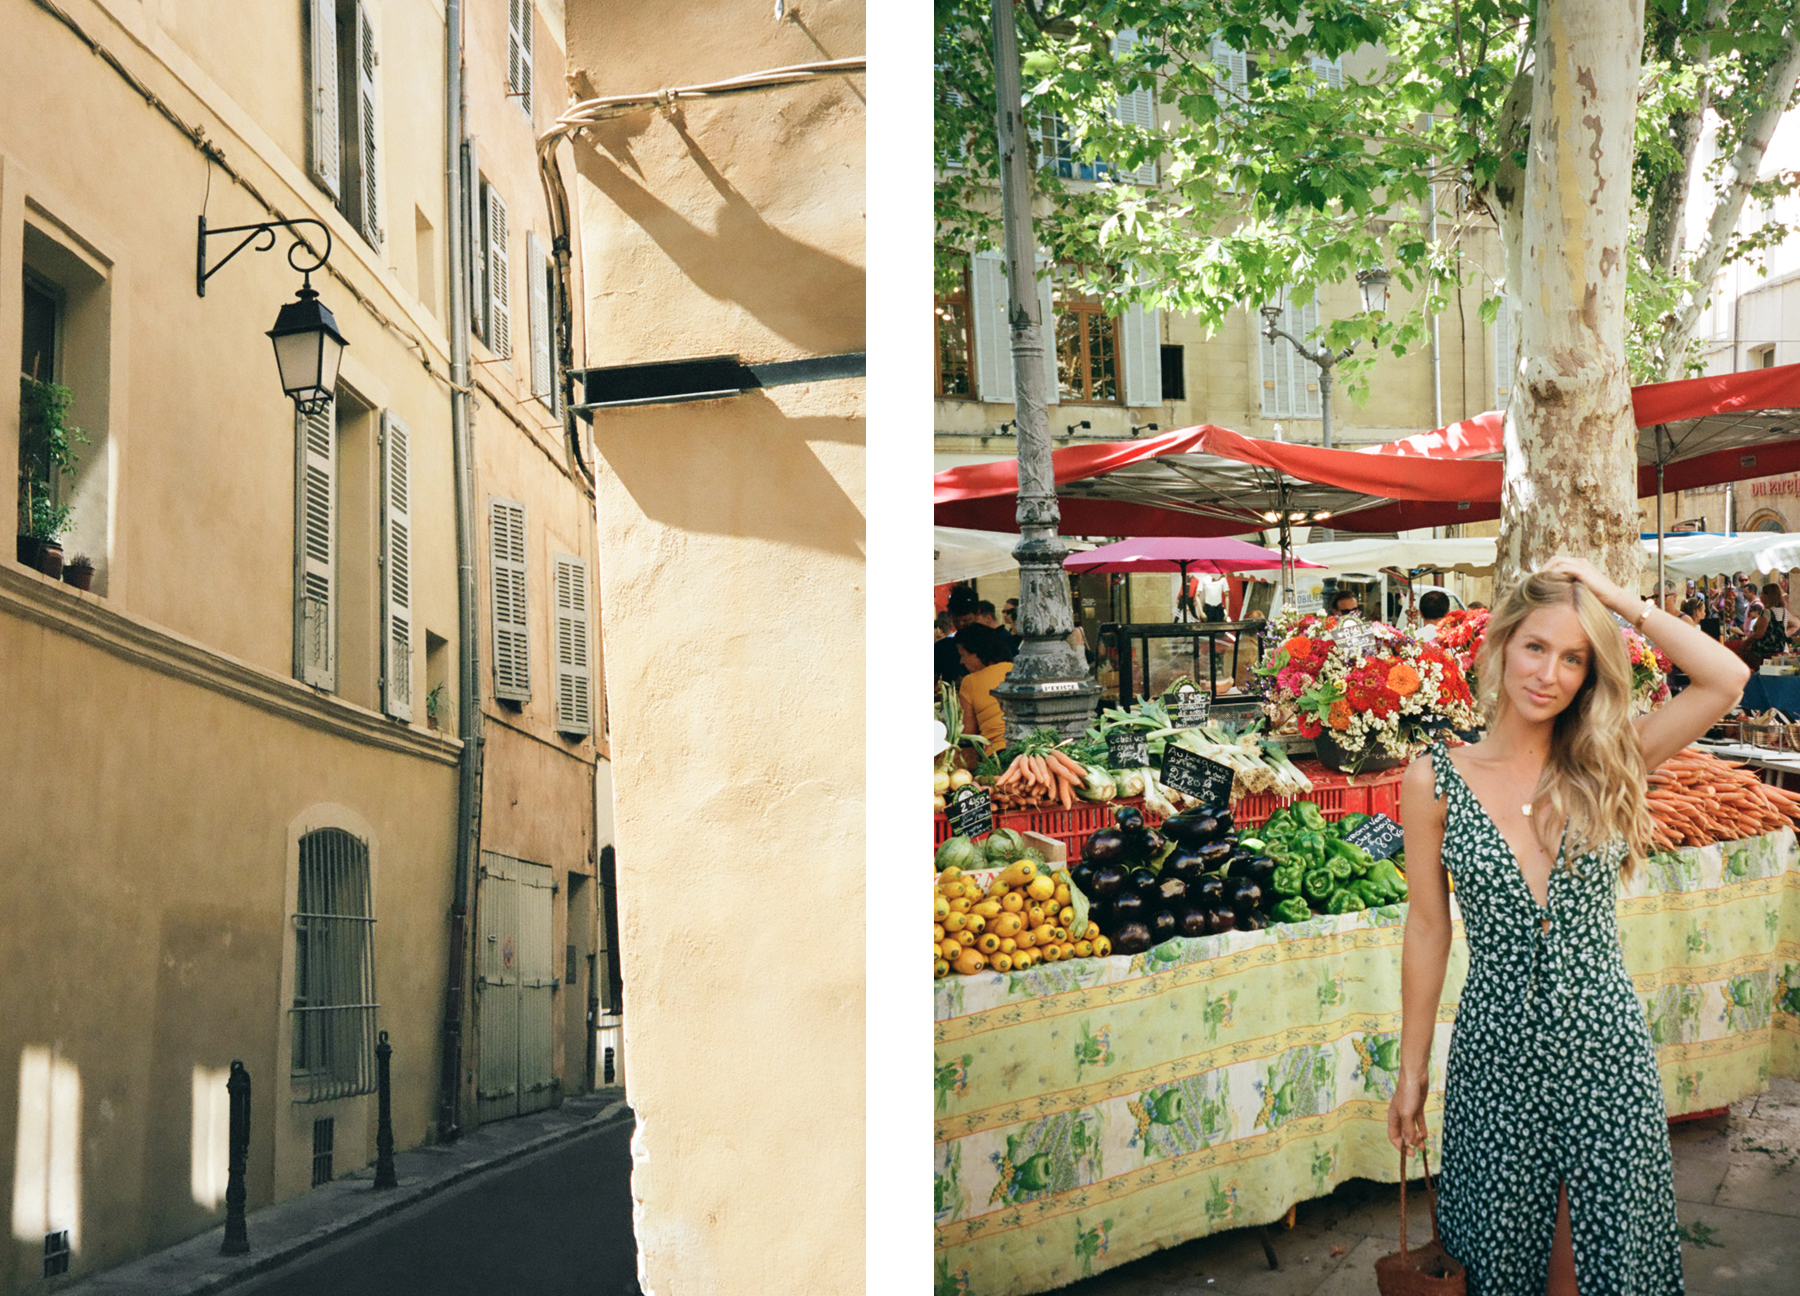 Aix_En_Provence_Carin_Olsson_01.jpg